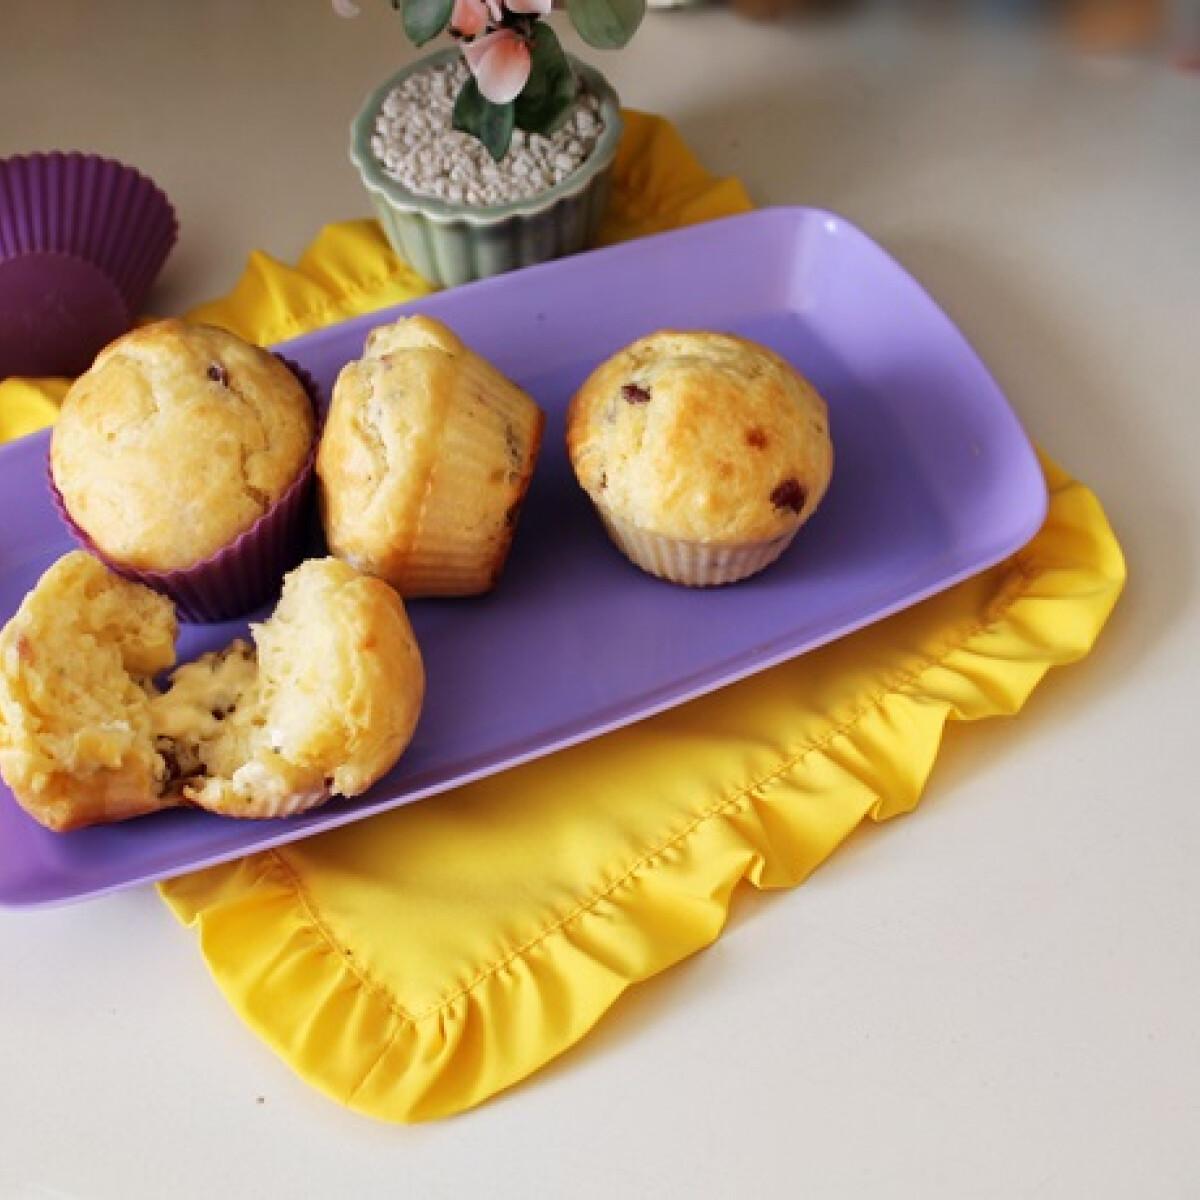 Krémsajtos-füstölthúsos muffin Iluskától